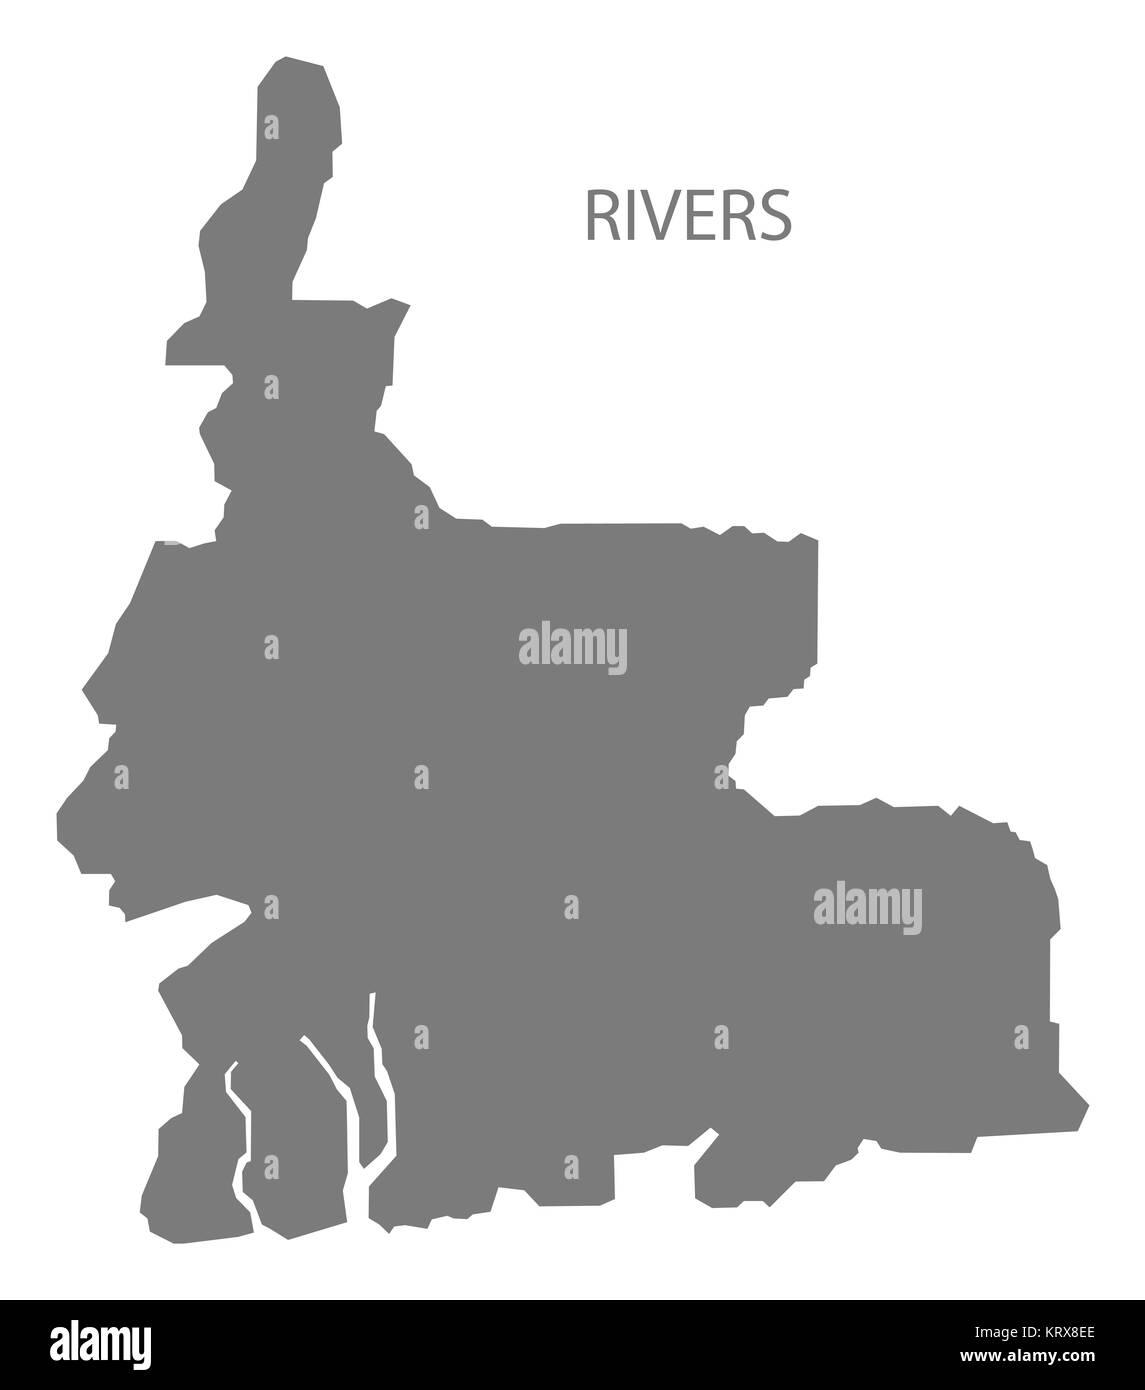 Rivers Nigeria Map grey - Stock Image